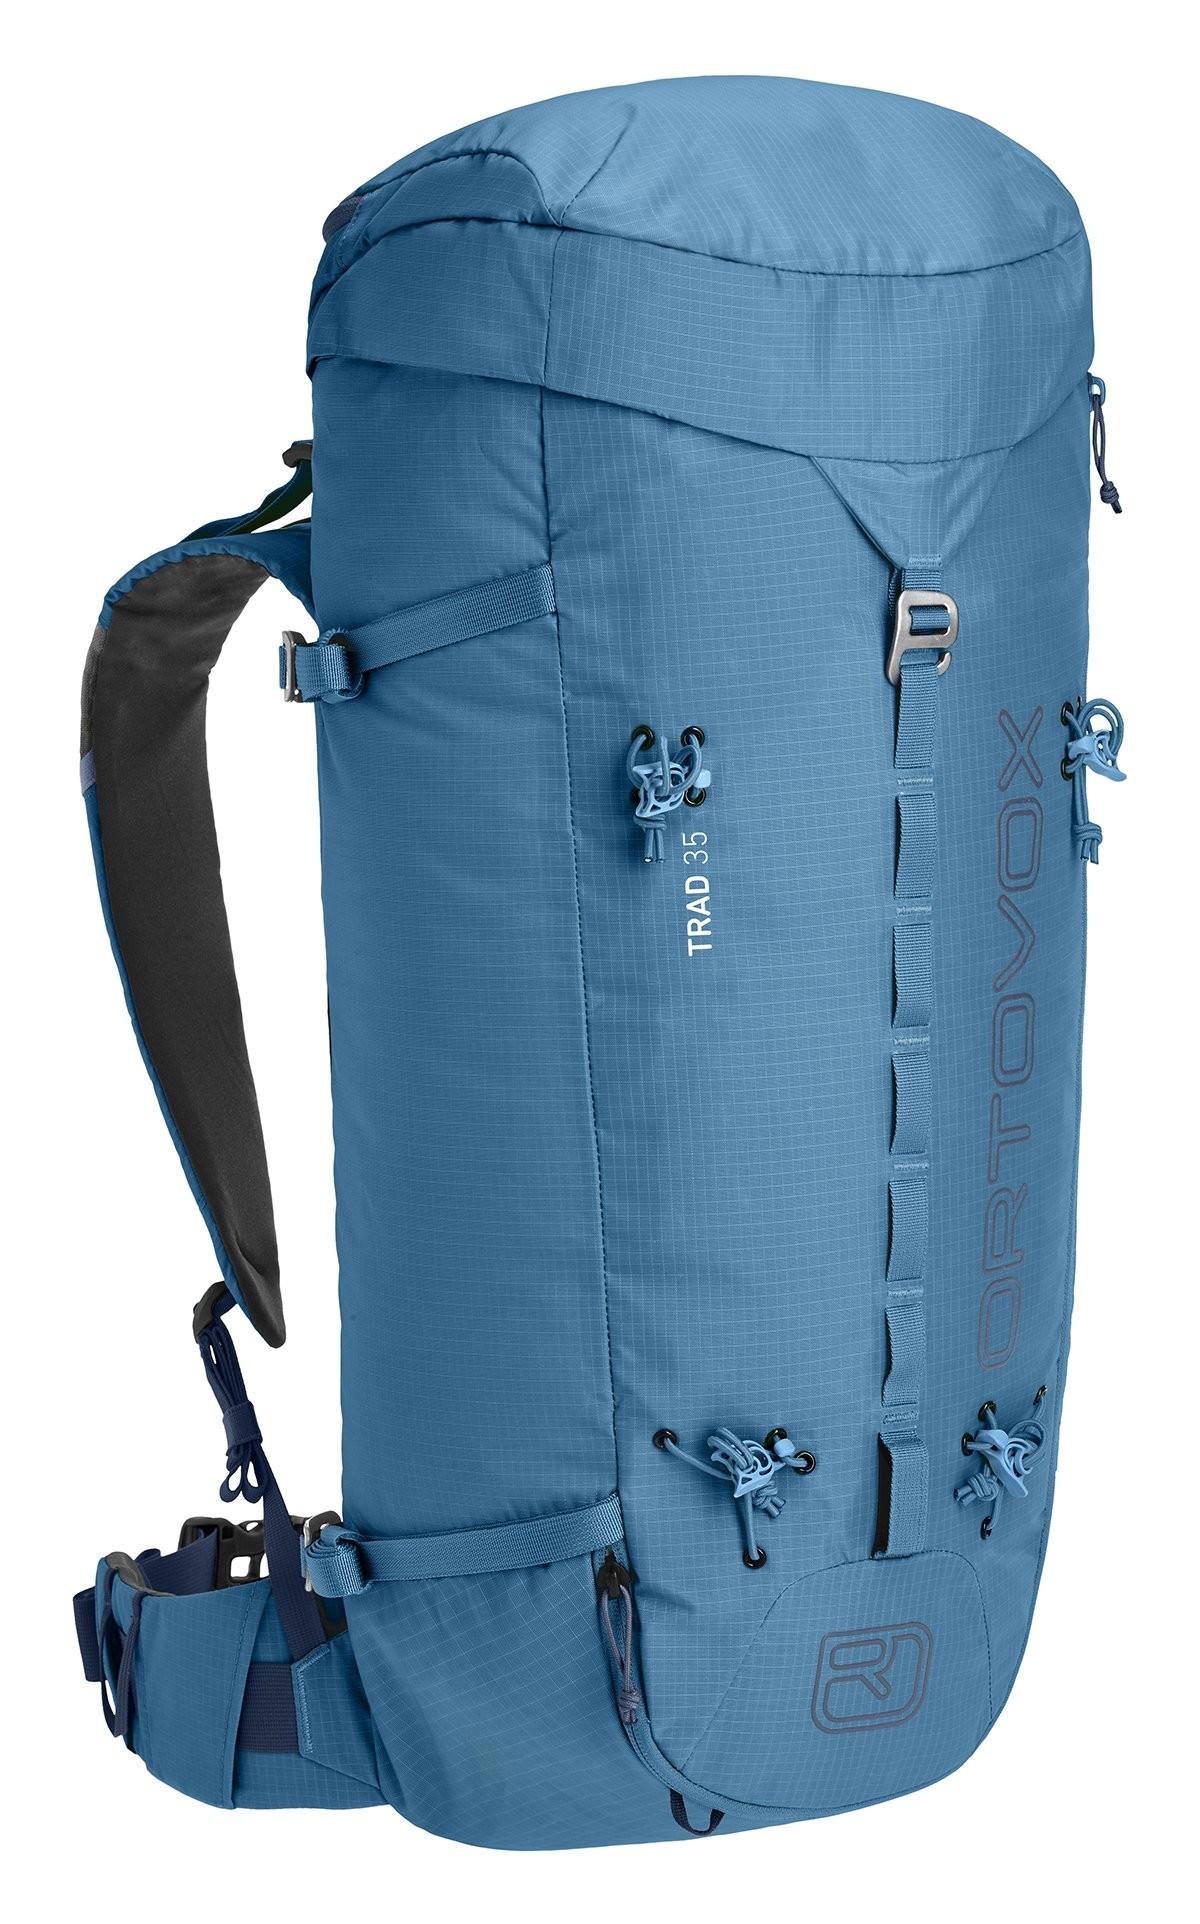 Ortovox Trad 35 - Climbing backpack